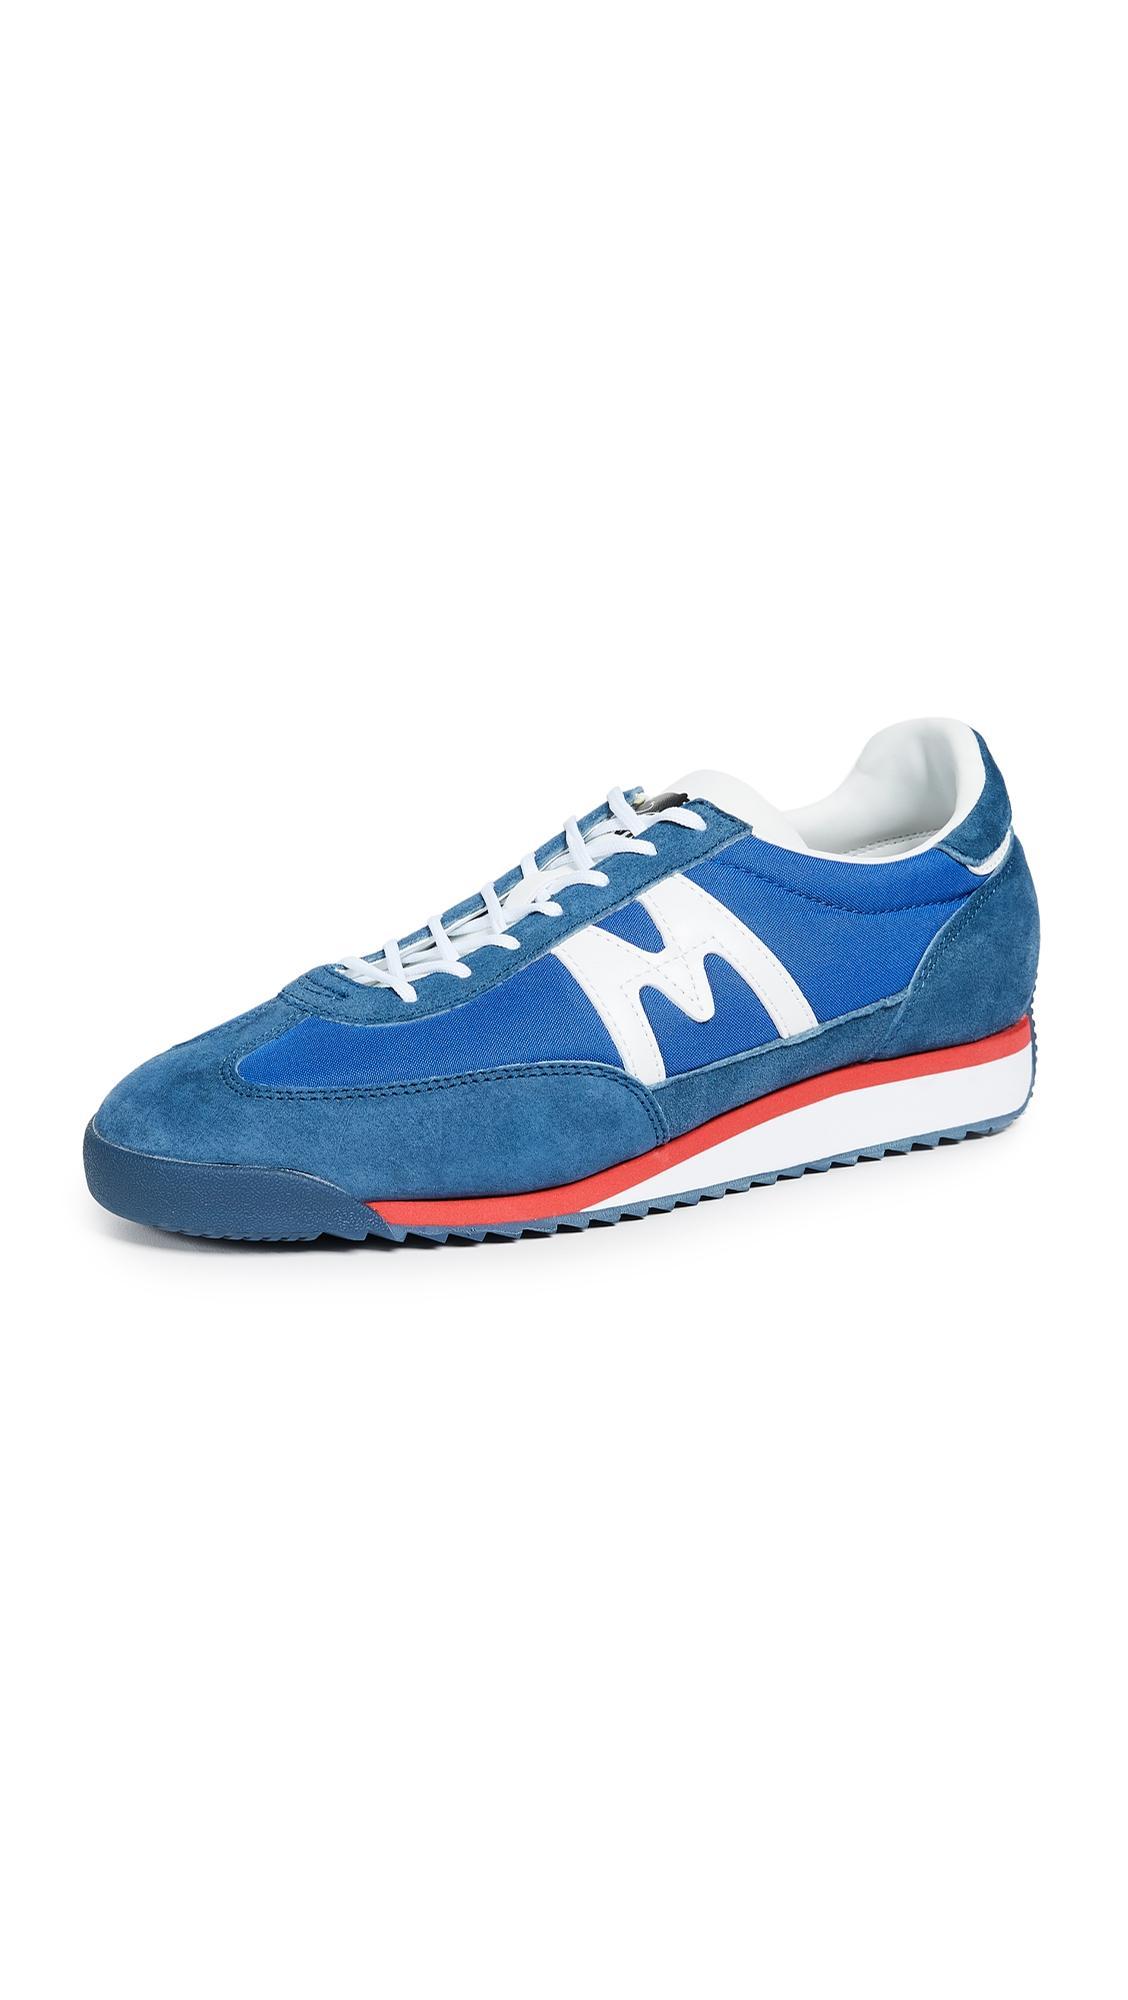 6a65c229a0784 Karhu Championair Sneakers In Classic Blue White